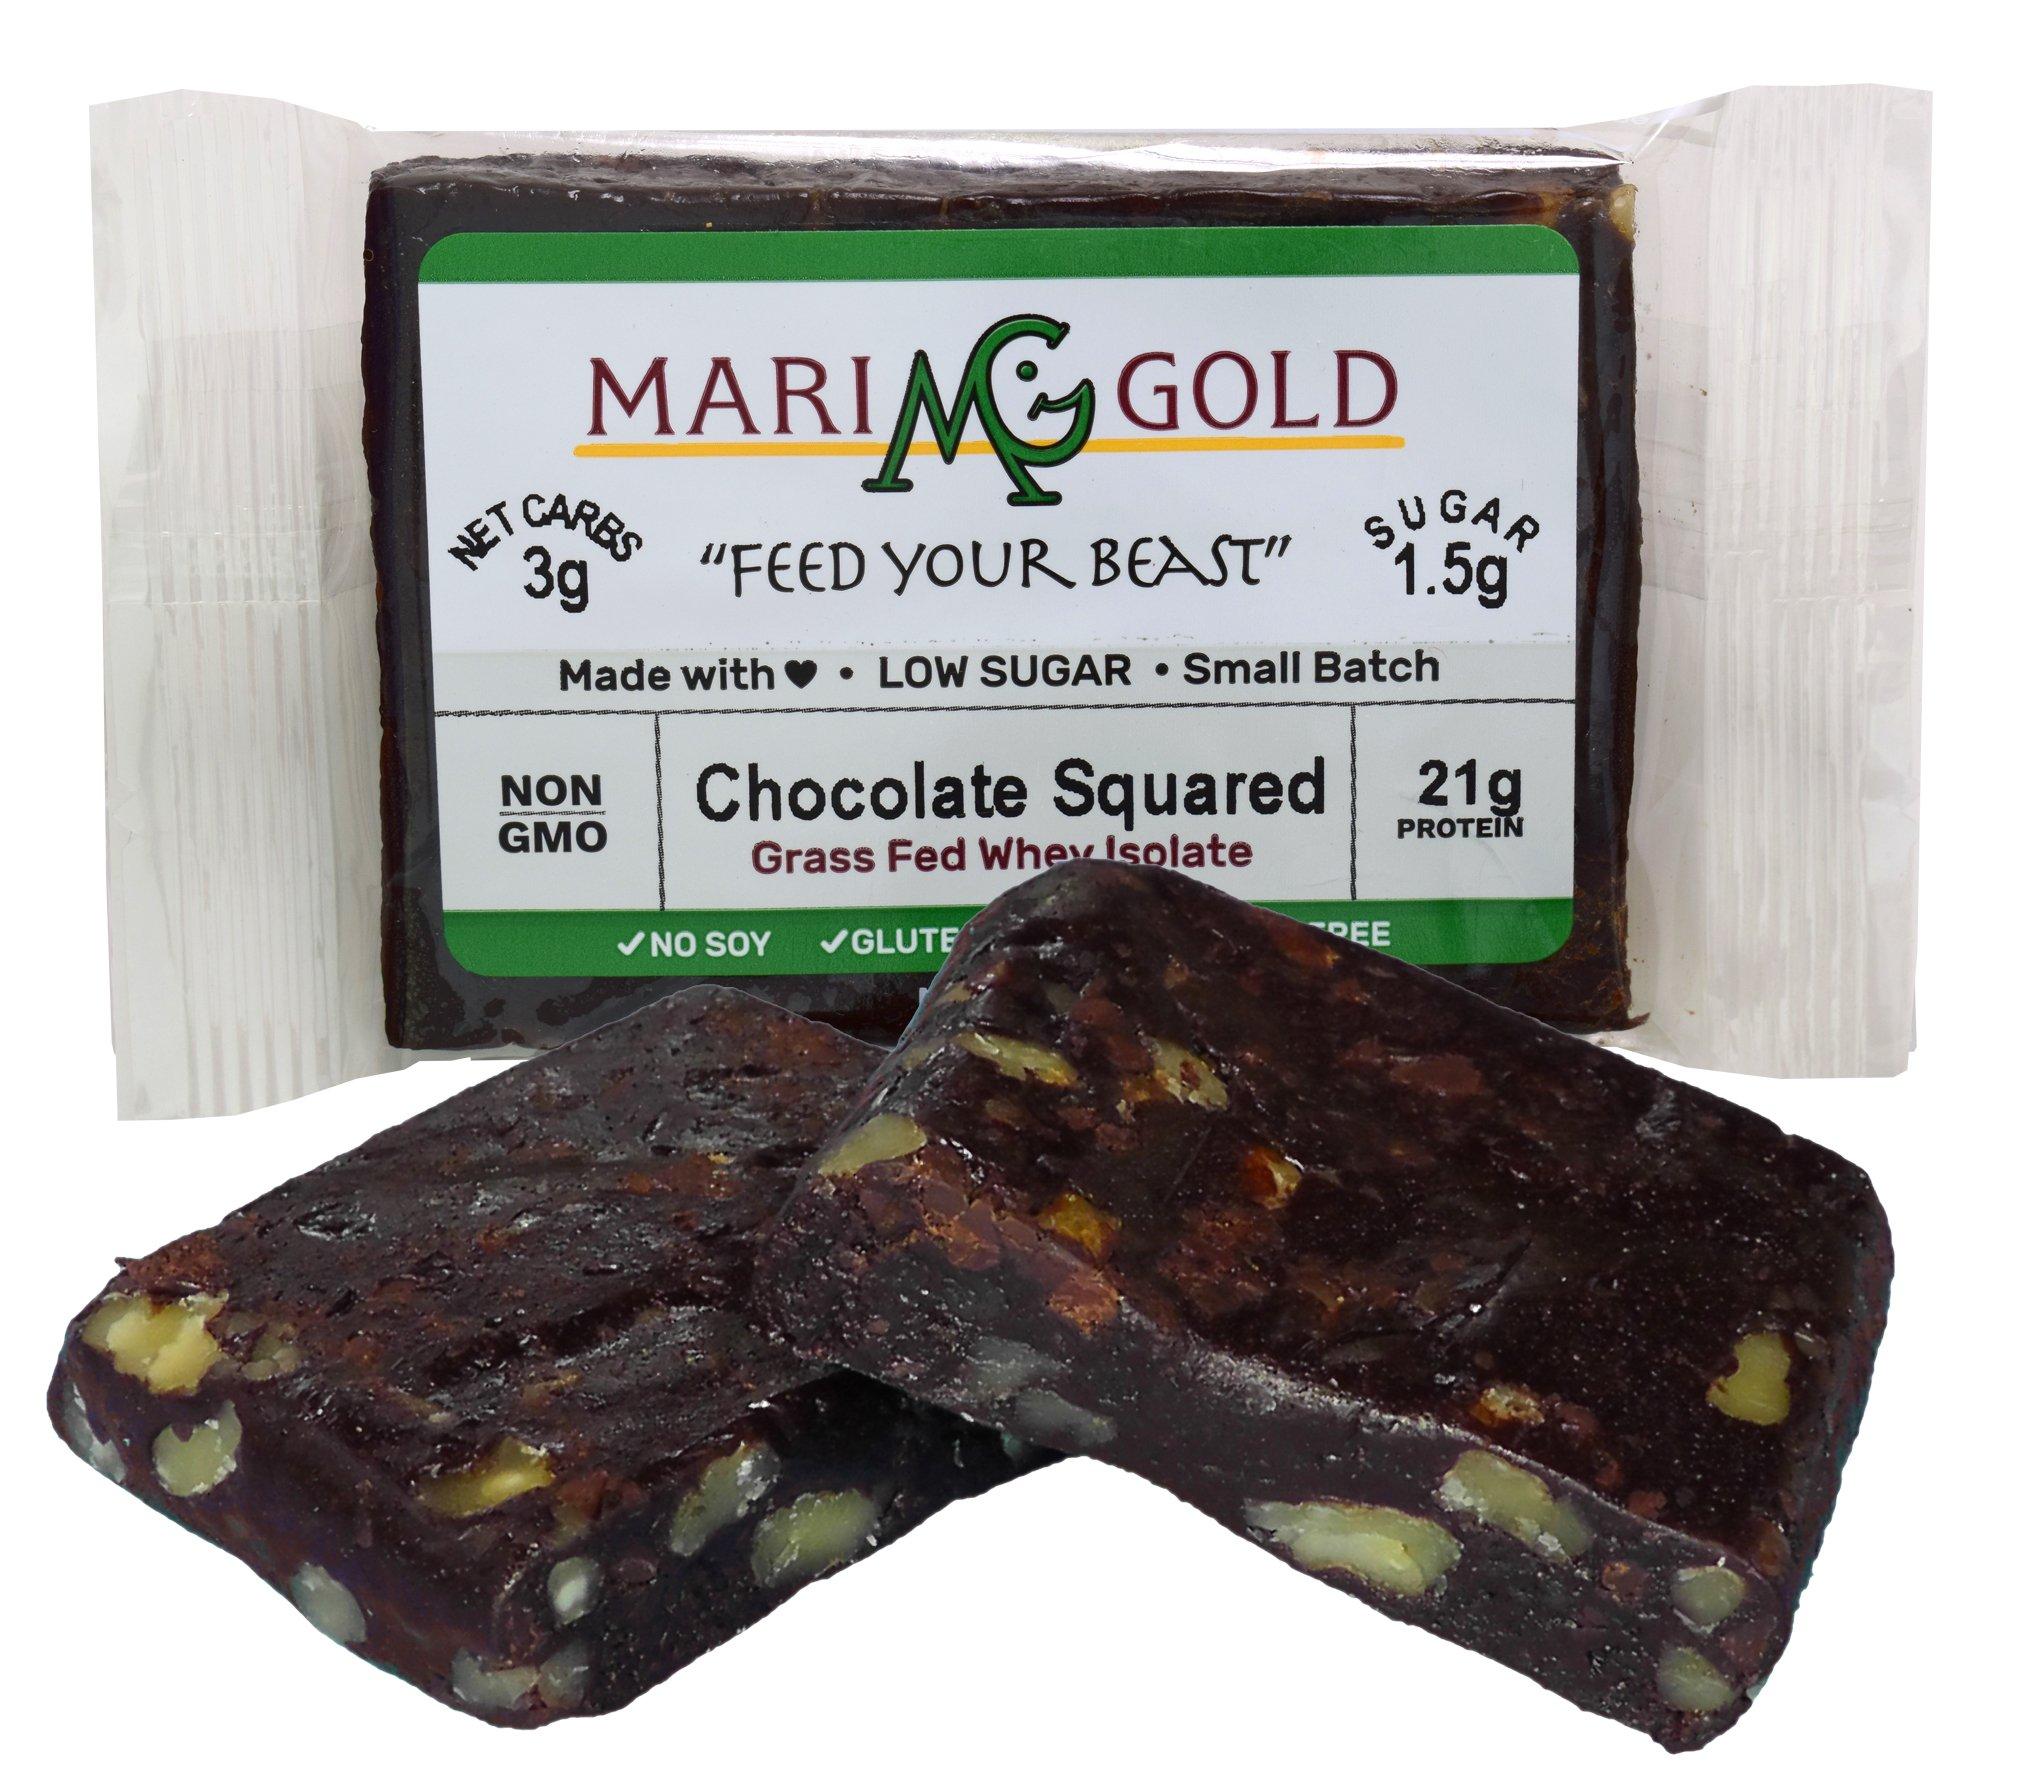 Keto (2-3 NET CARB) Protein Bar by MariGold - Amazing Taste Ketogenic Snacks - Organic Fats, 1 g Sugar, 21 g Protein GRASS FED Whey - Non GMO. Made Fresh, Ships Fresh. (12 bars) by MariGold Bars (Image #6)